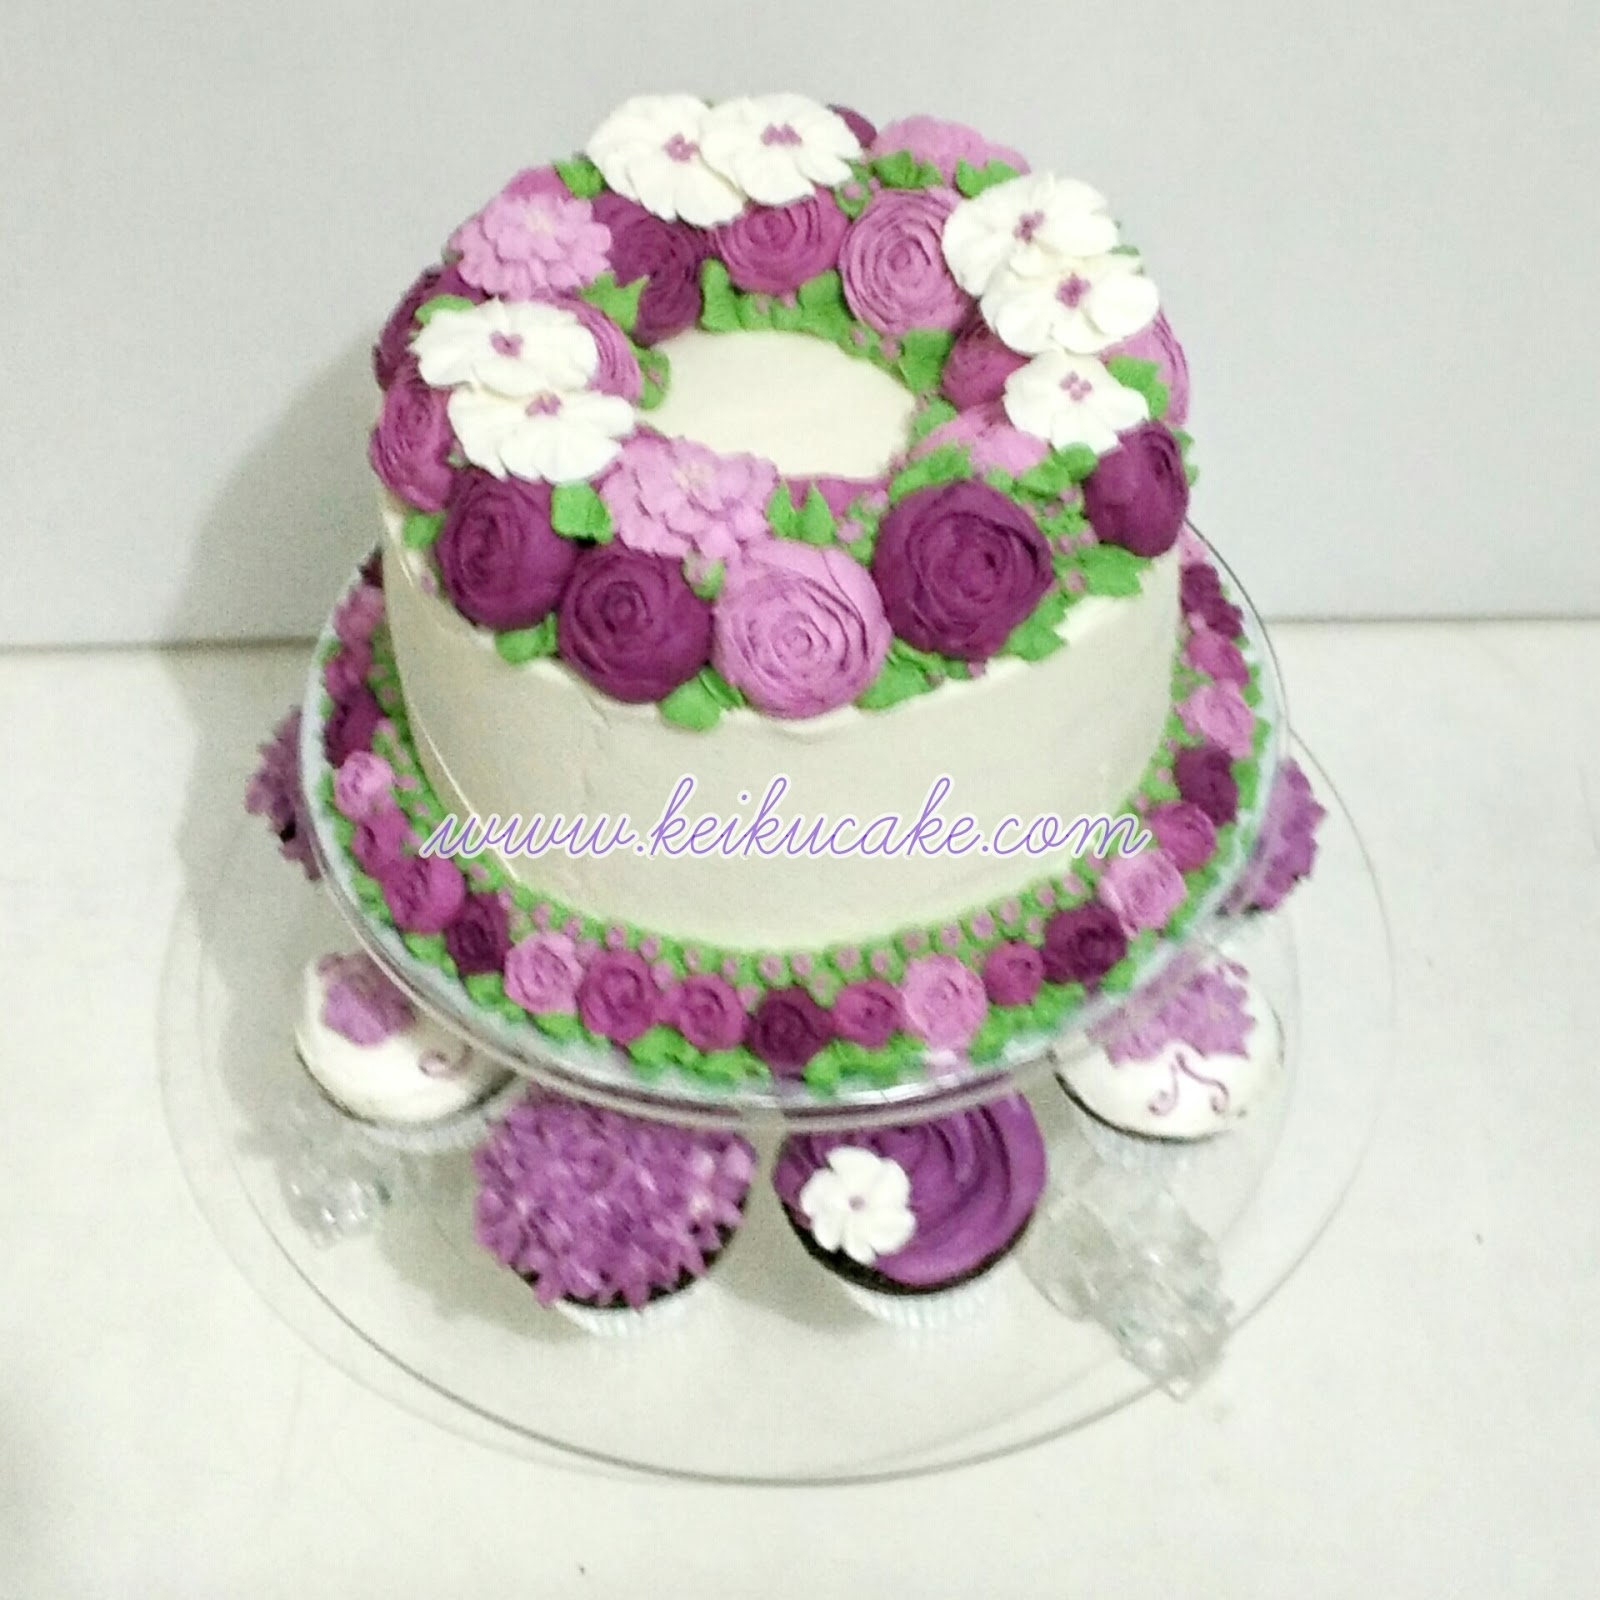 Keiku Cake Purple wreath buttercream flowers cake